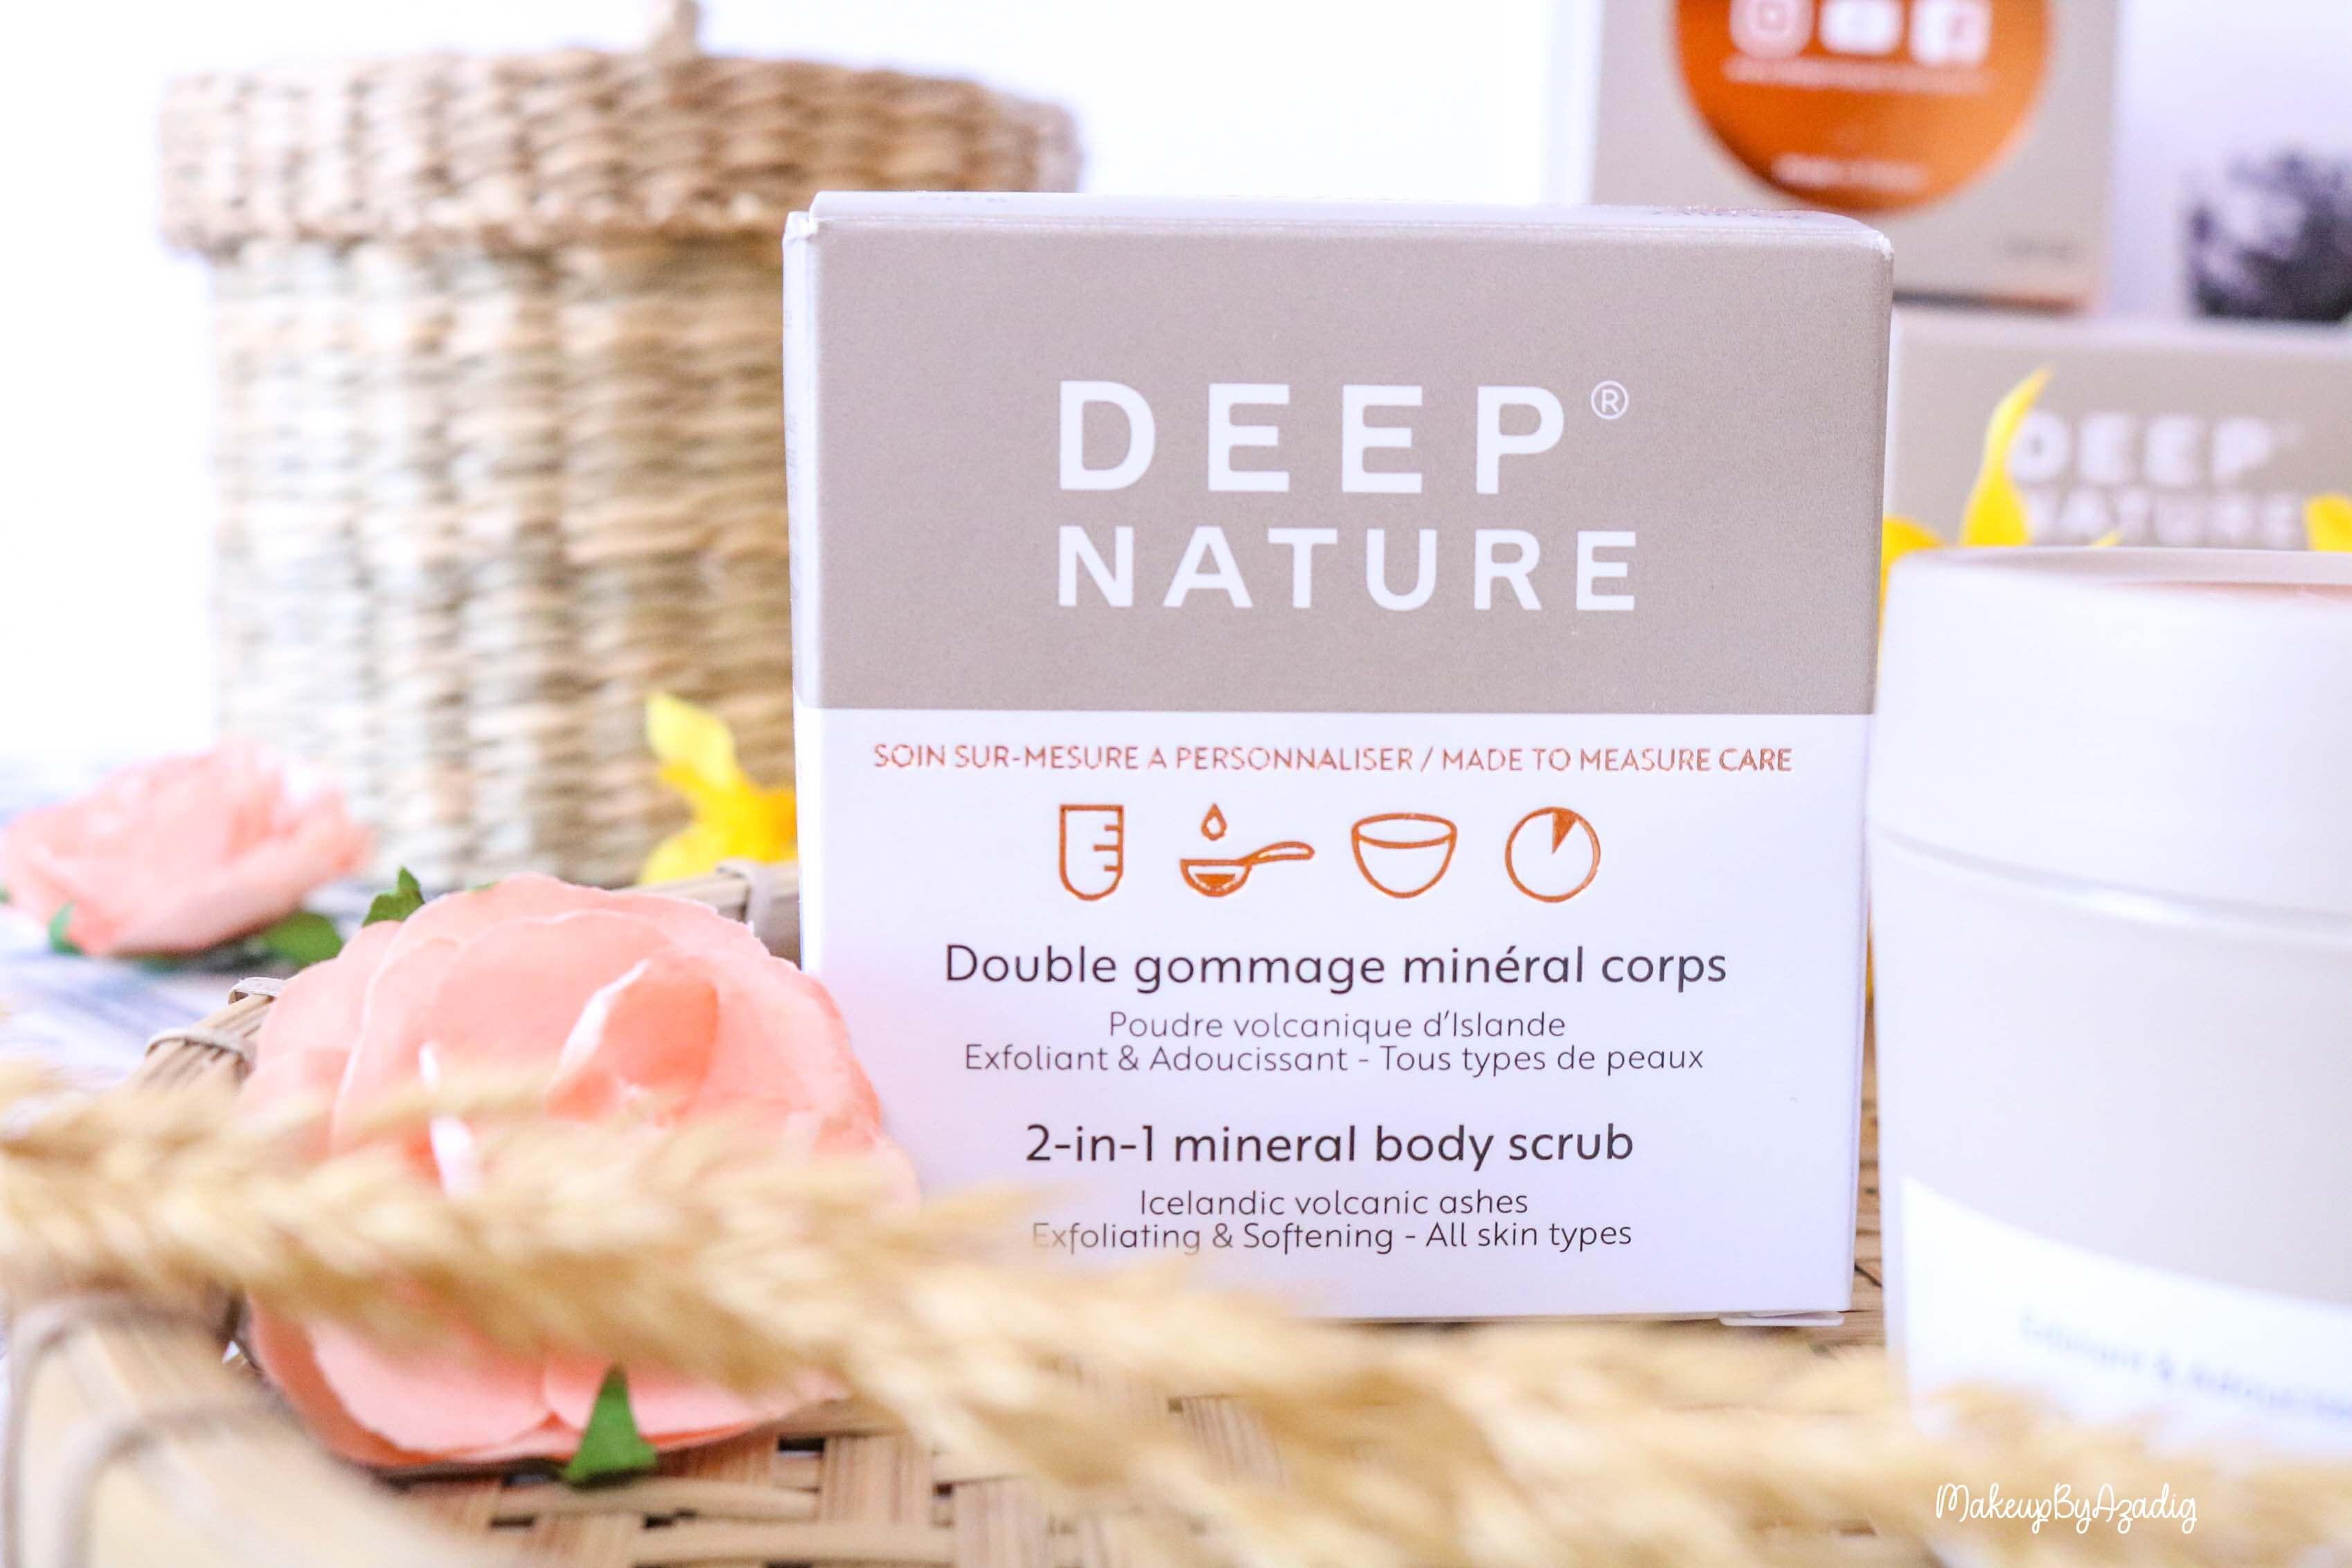 diy-gommage-corps-maison-soi-meme-deep-nature-spa-mineraux-volcanique-islande-makeupbyazadig-top